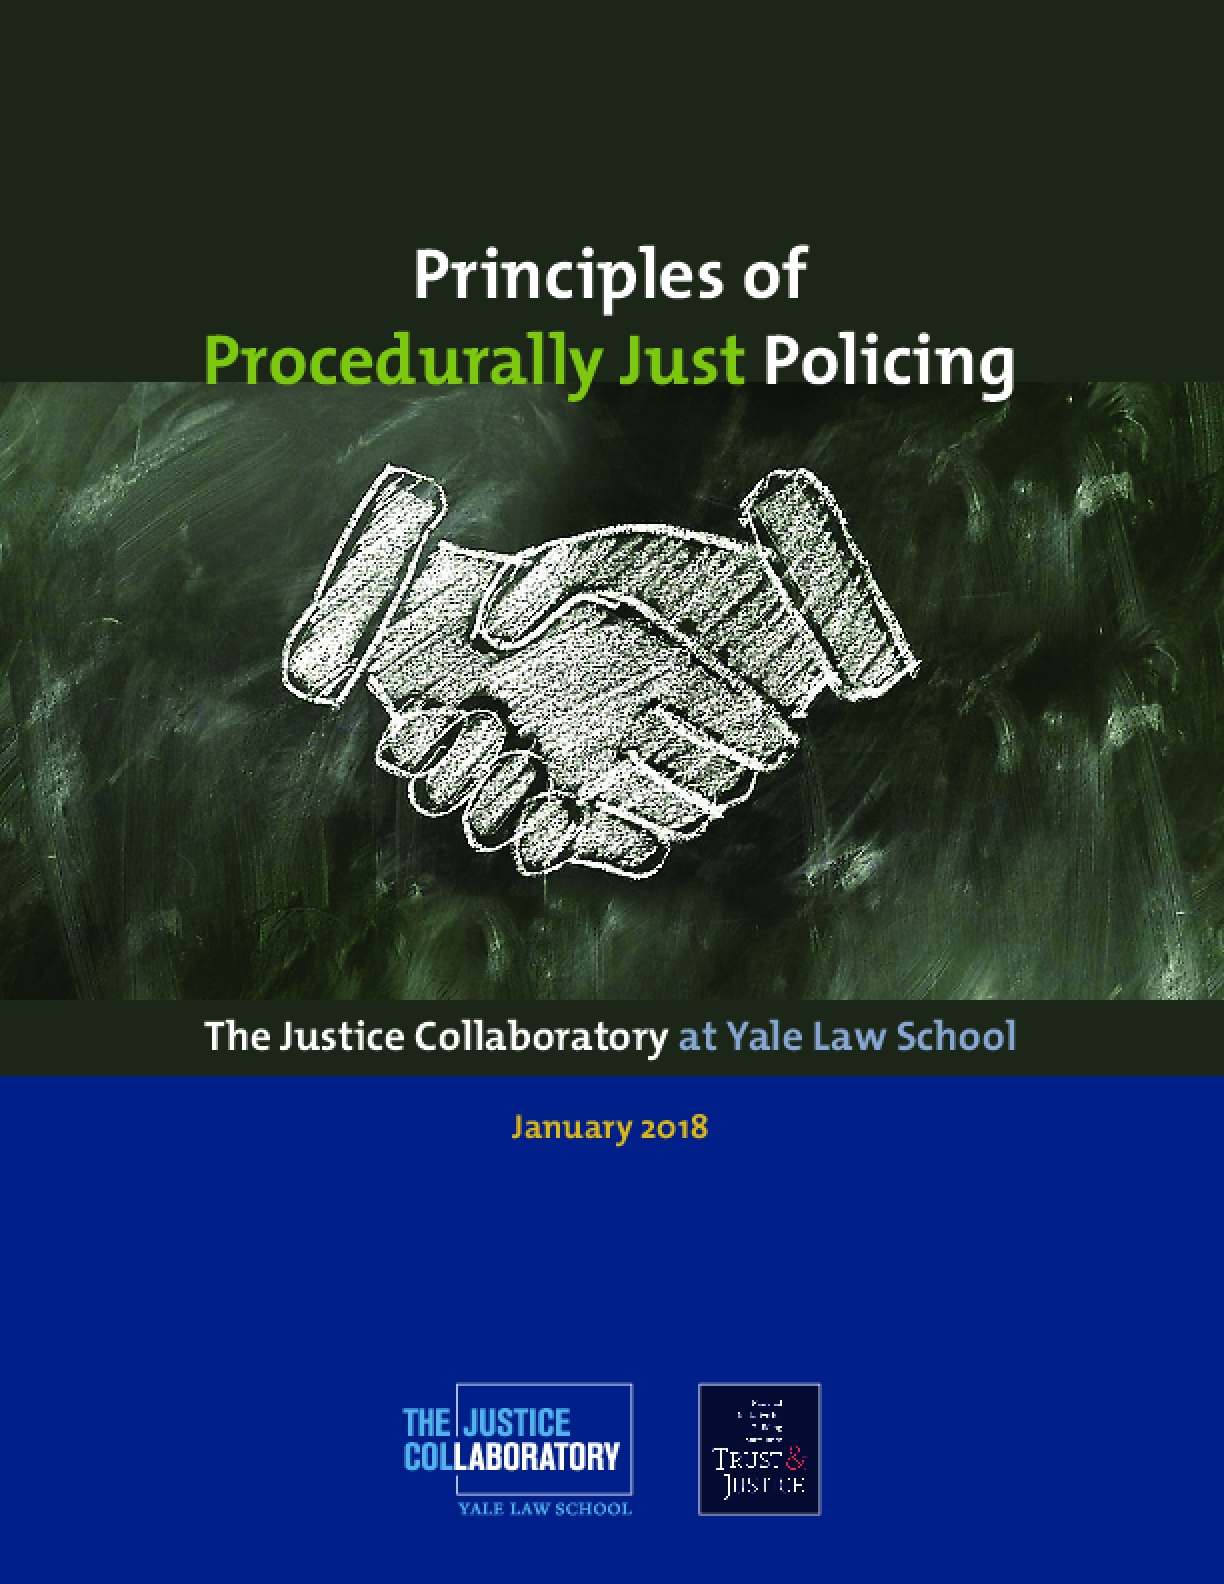 Principles of Procedurally Just Policing